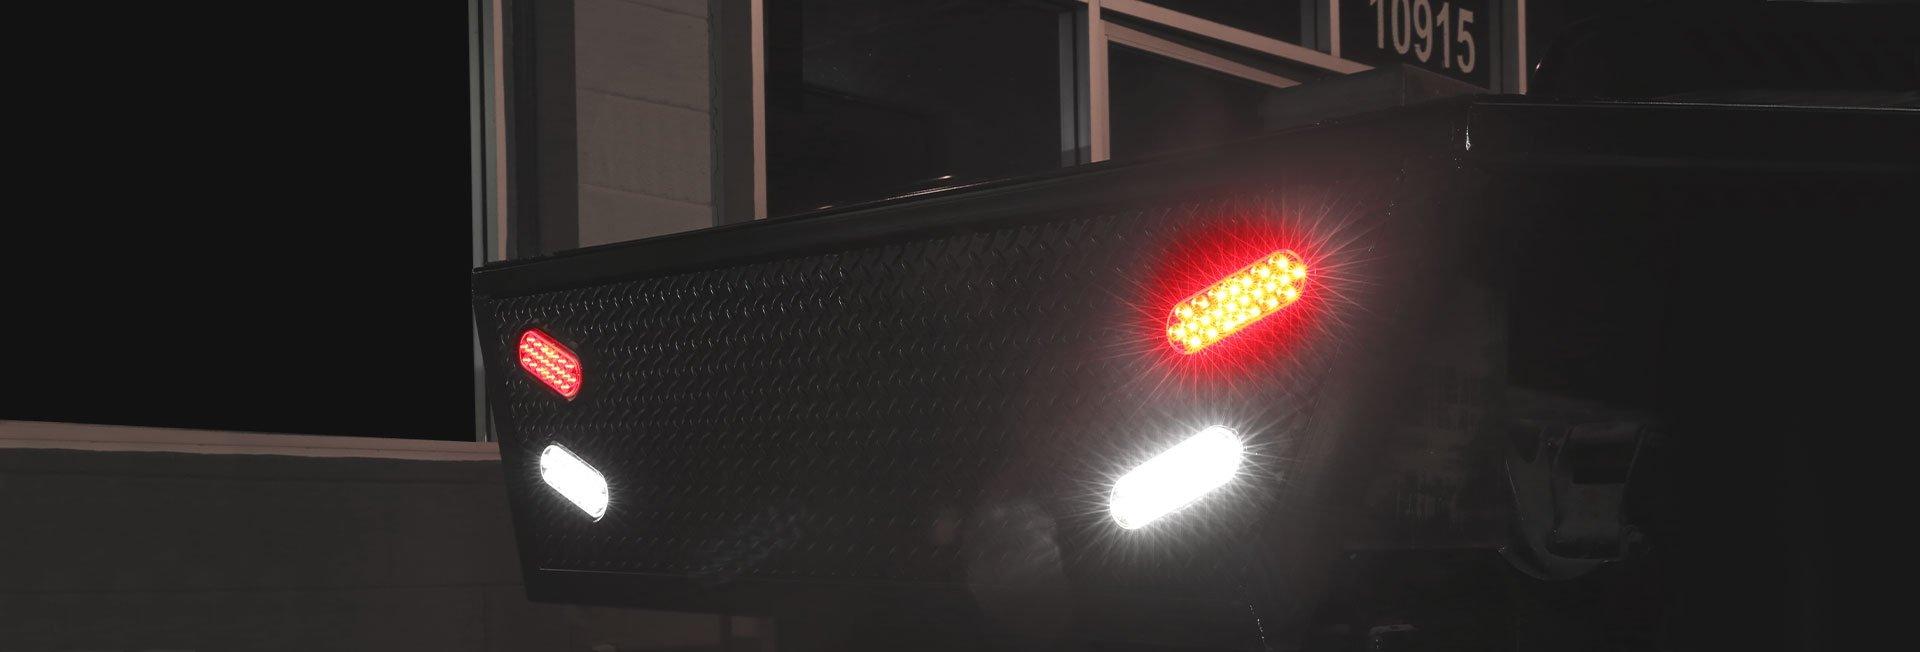 "6"" Oval Tail Lights"